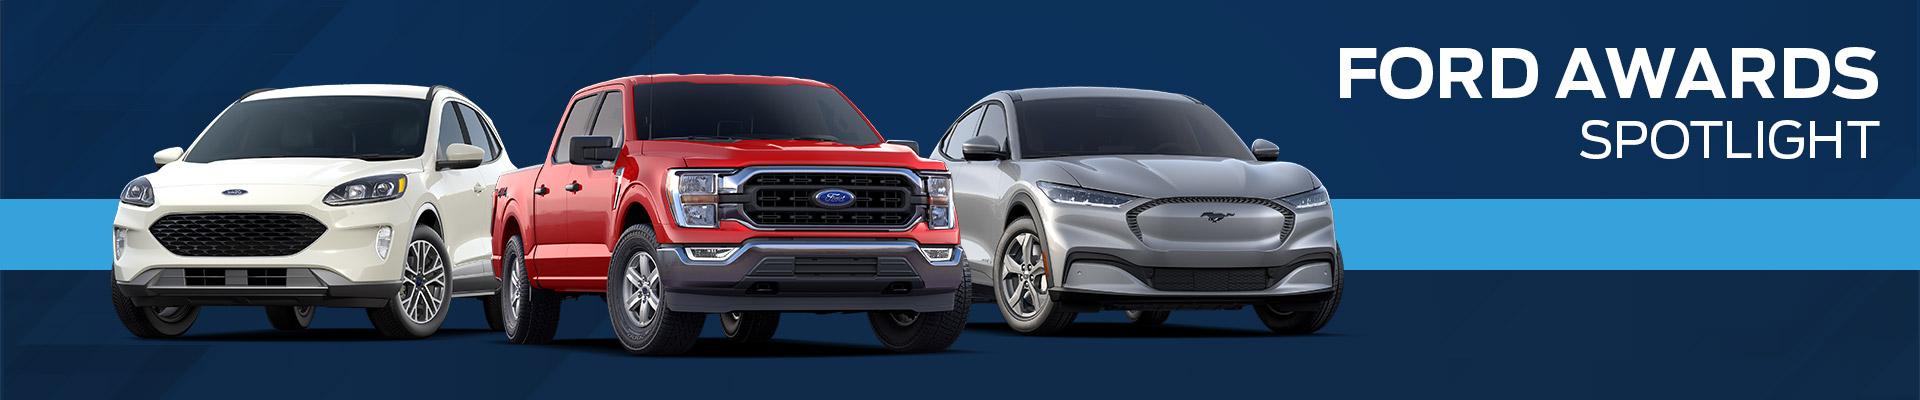 Ford Awards Spotlight - Sun State Ford - Orlando, FL